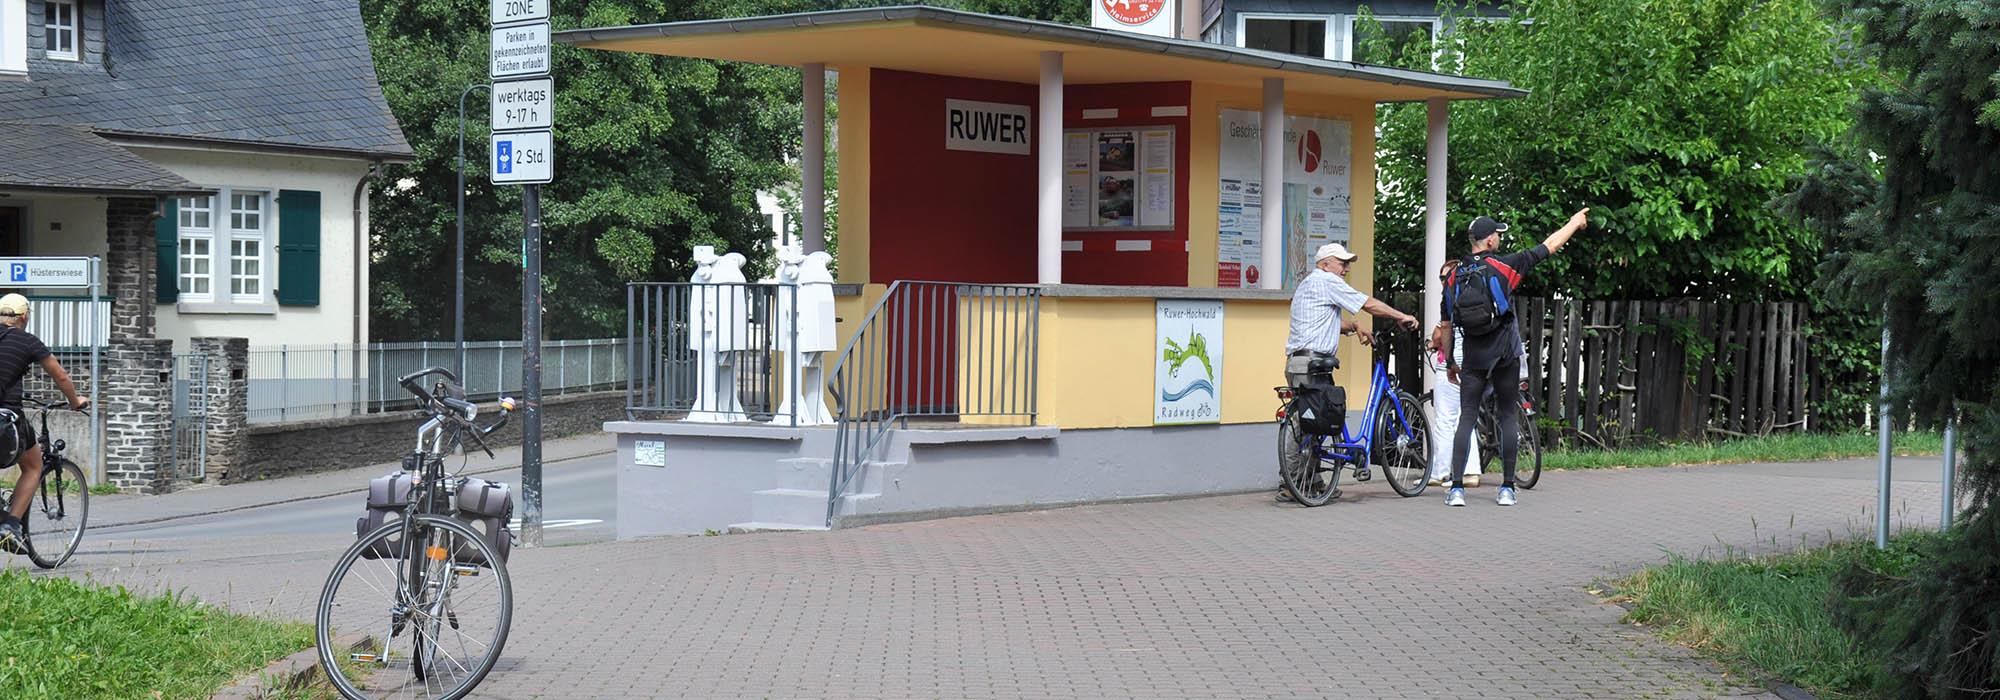 DSC_3184Ruwer-Radweg